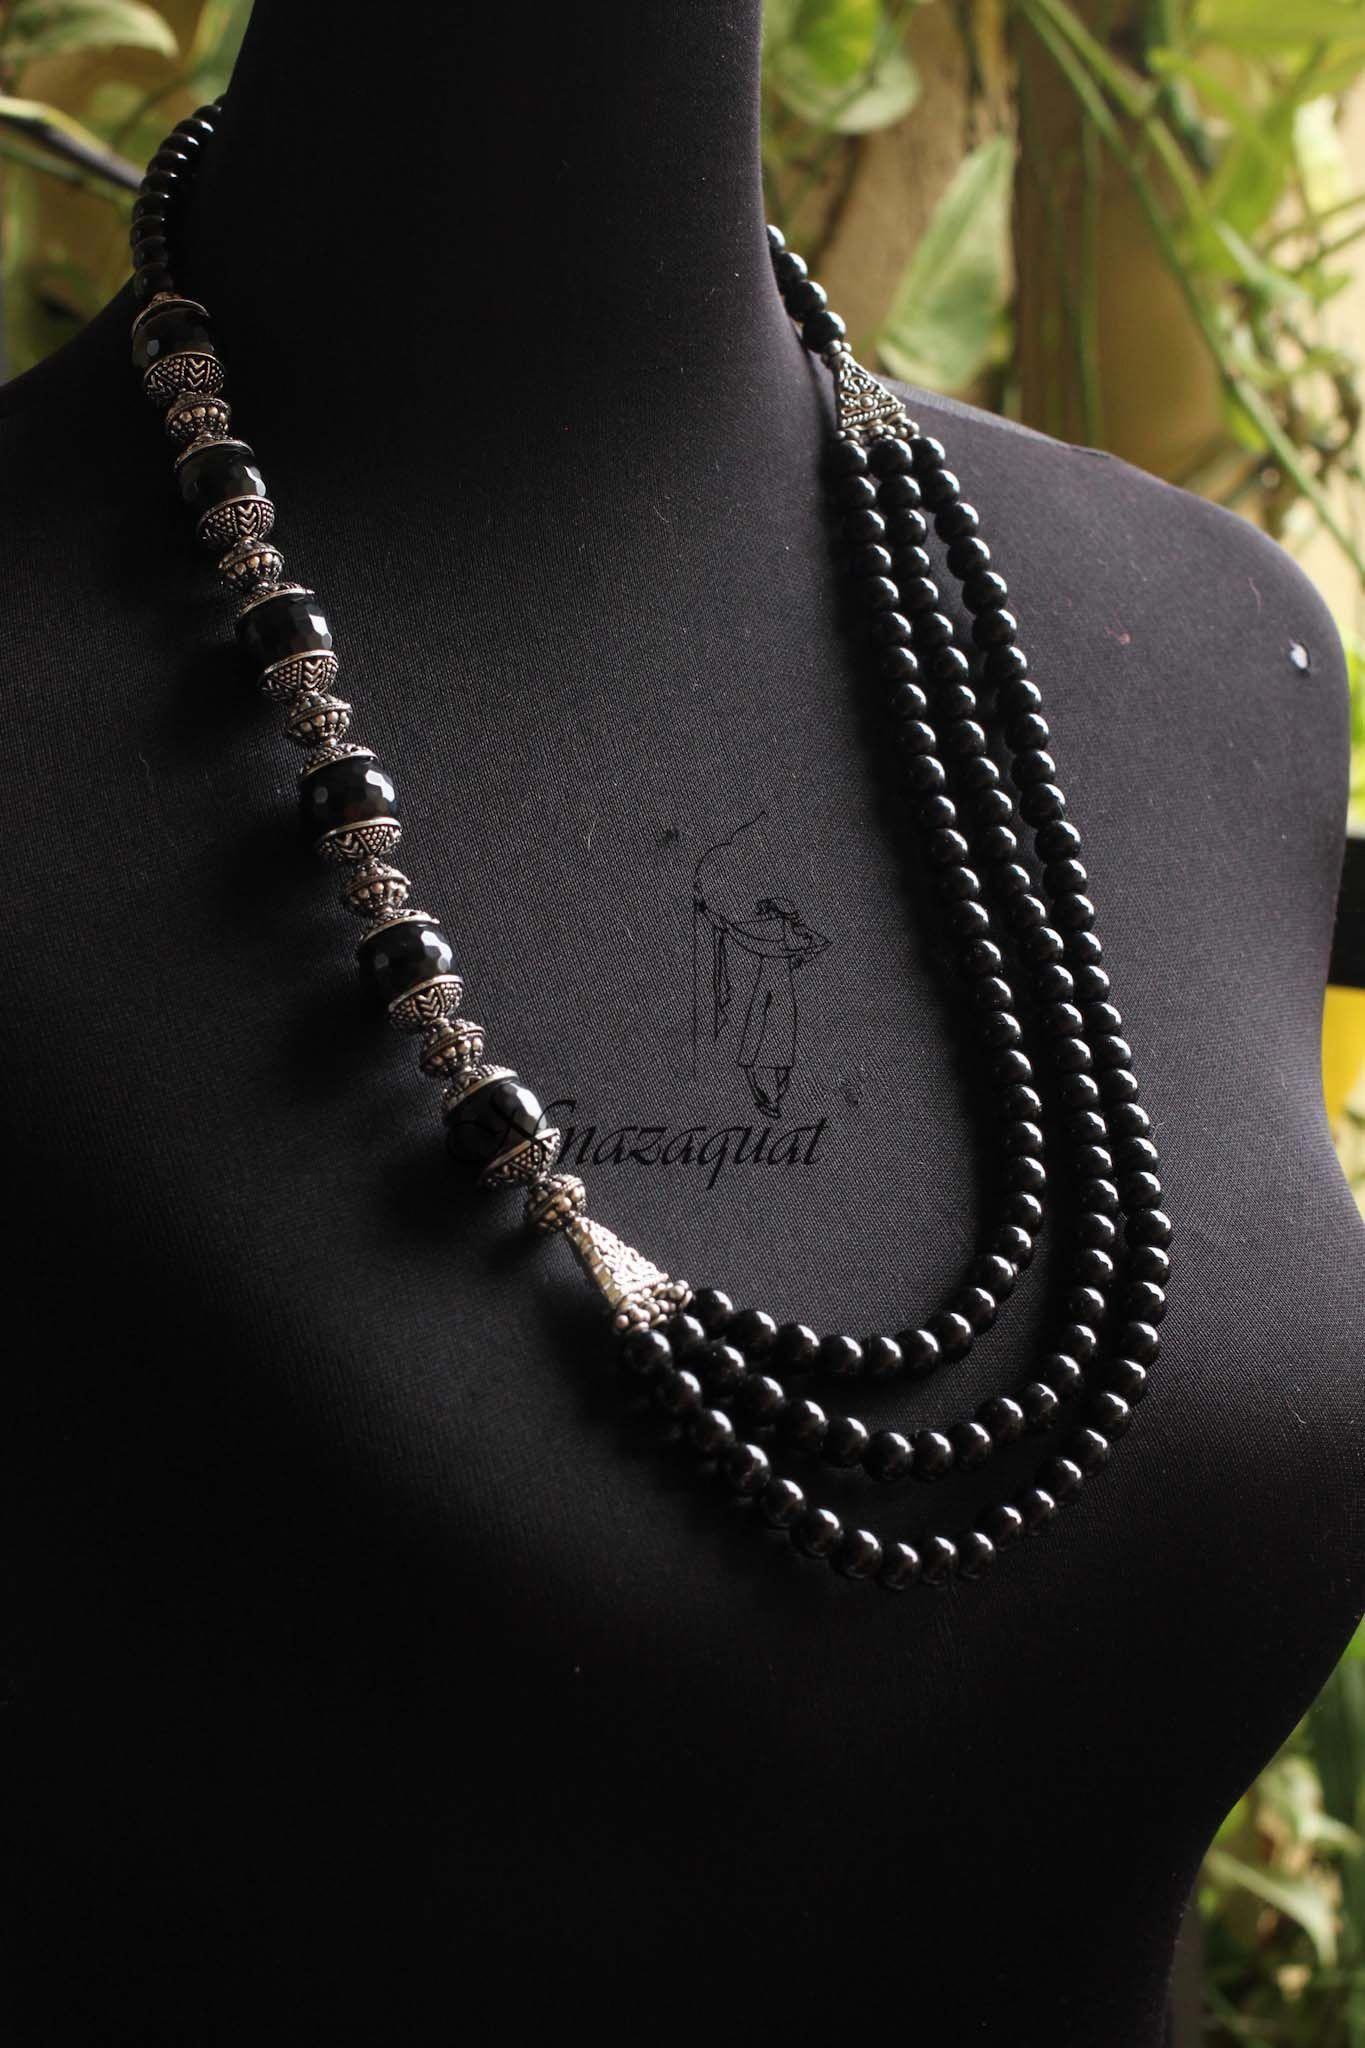 Christmas present from boyfriend Diamond necklace